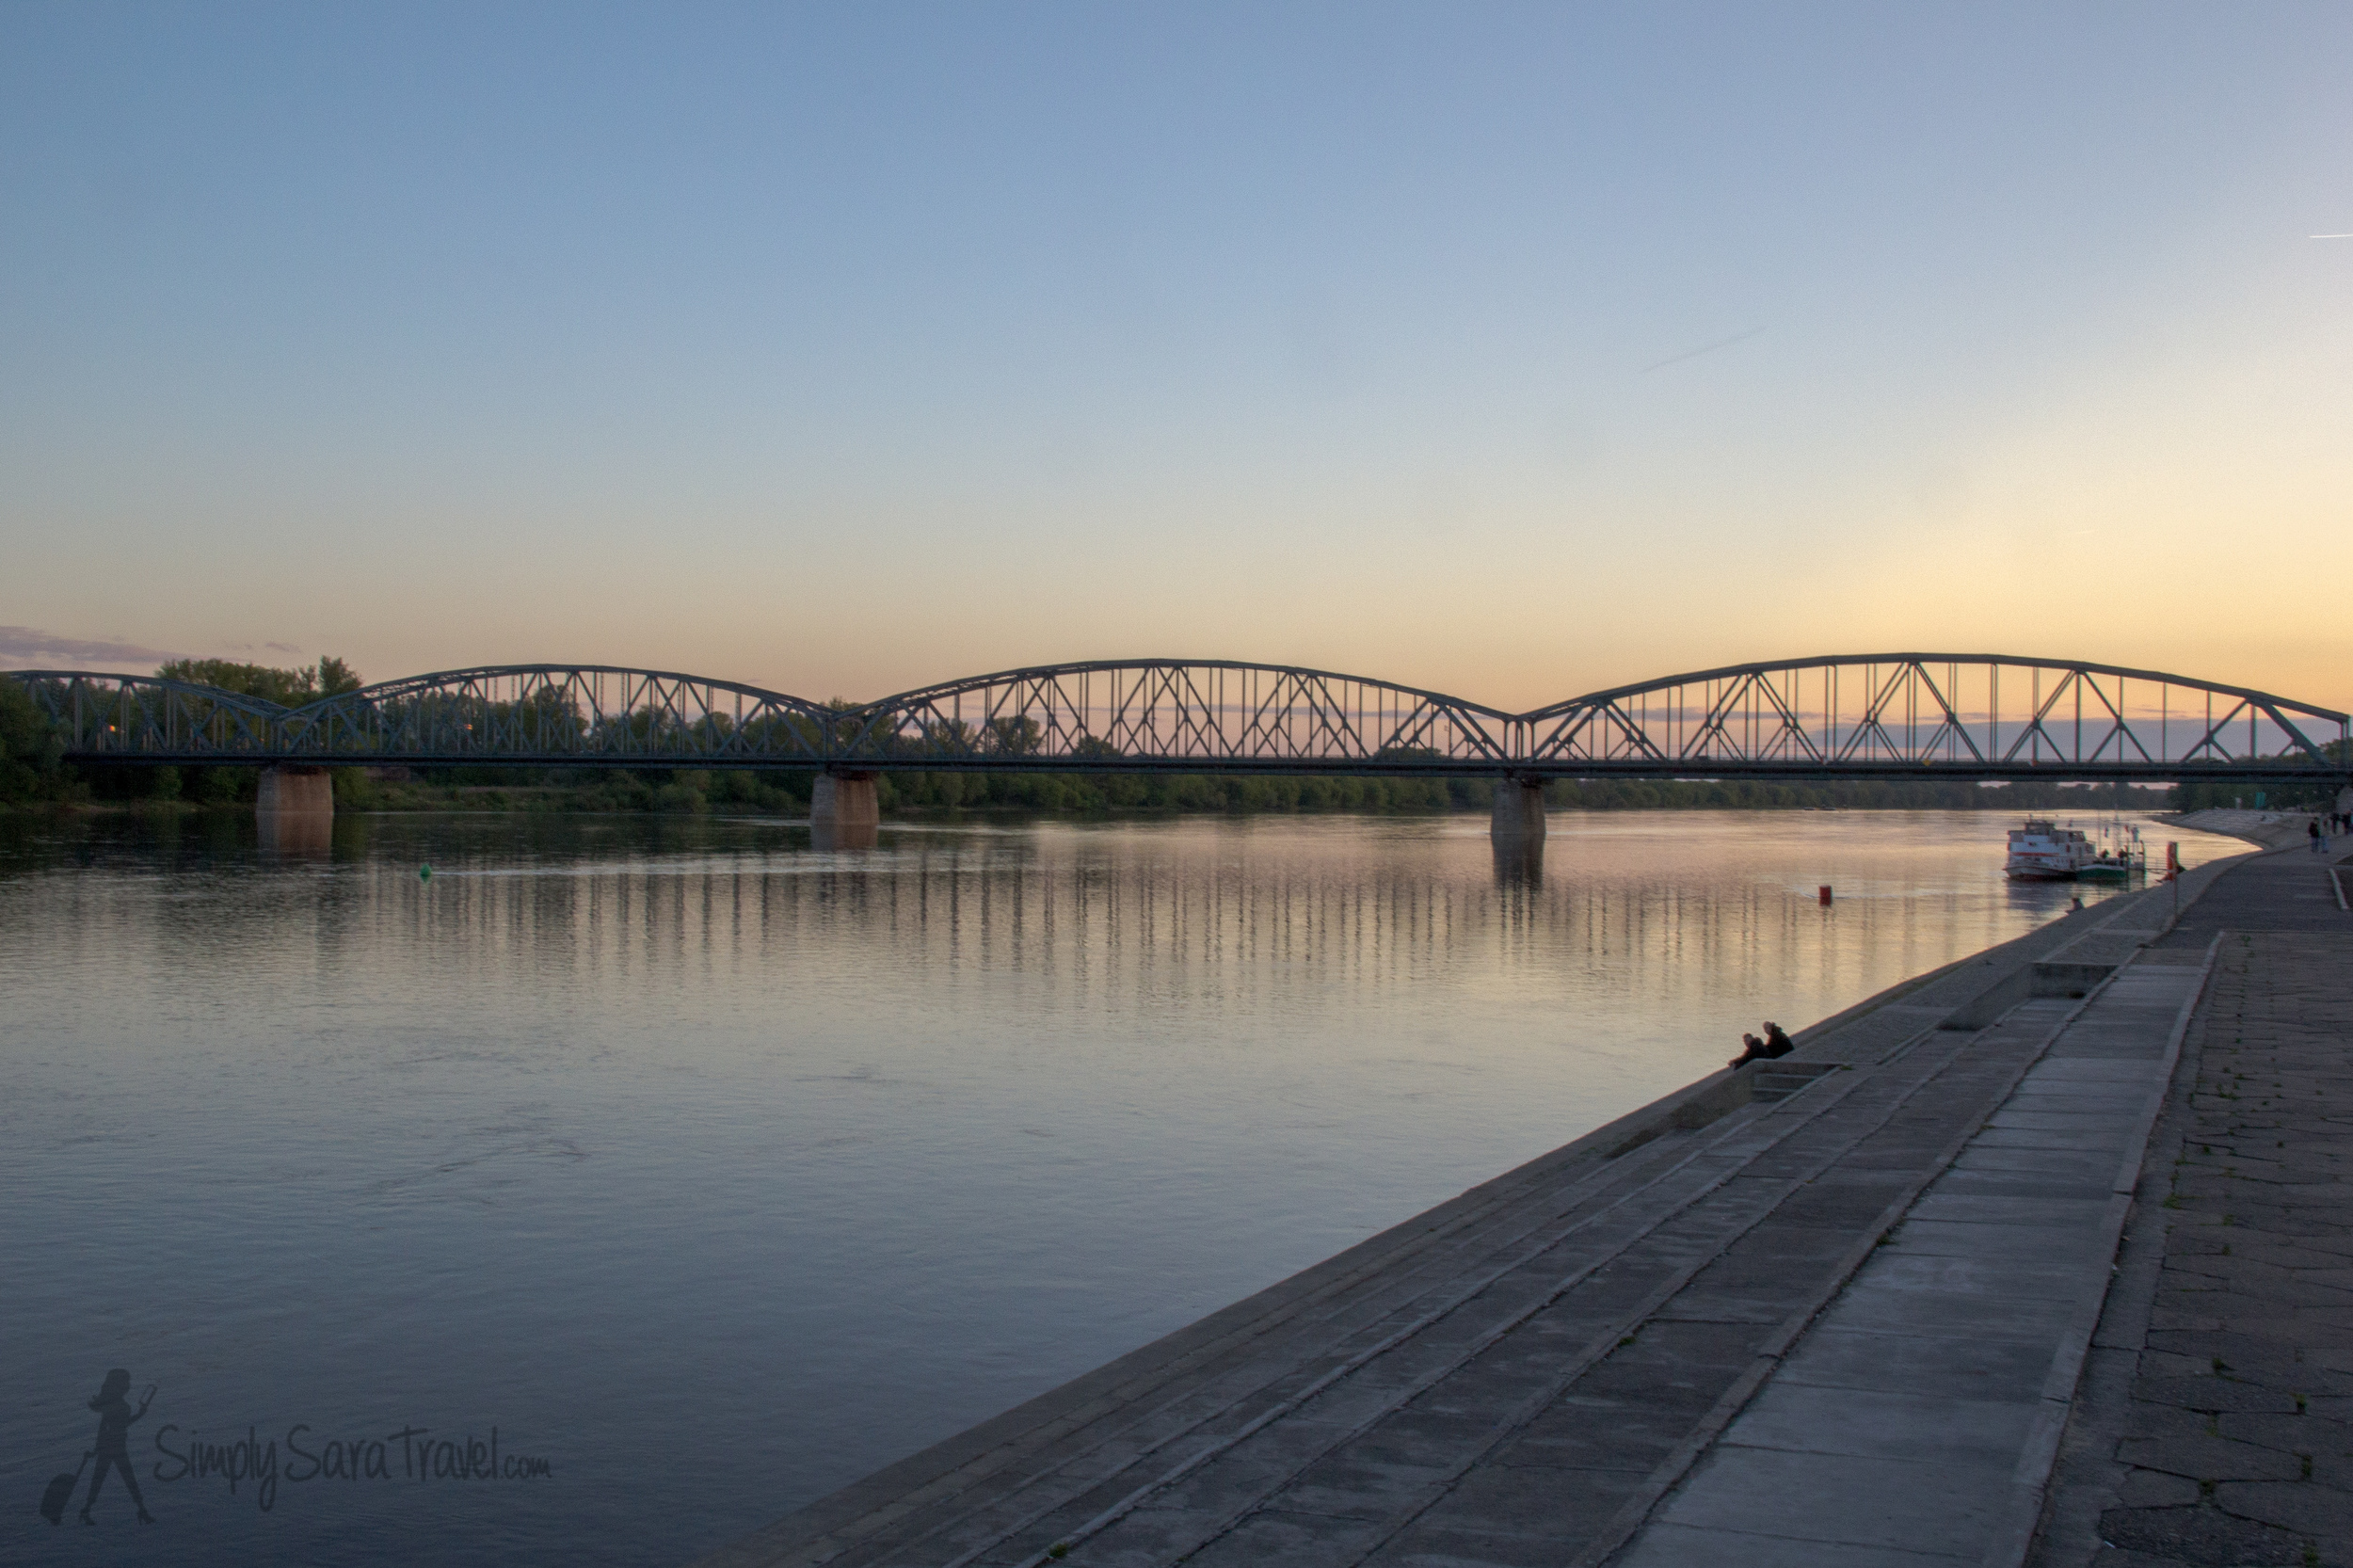 Sunset along theVistula River,Toruń